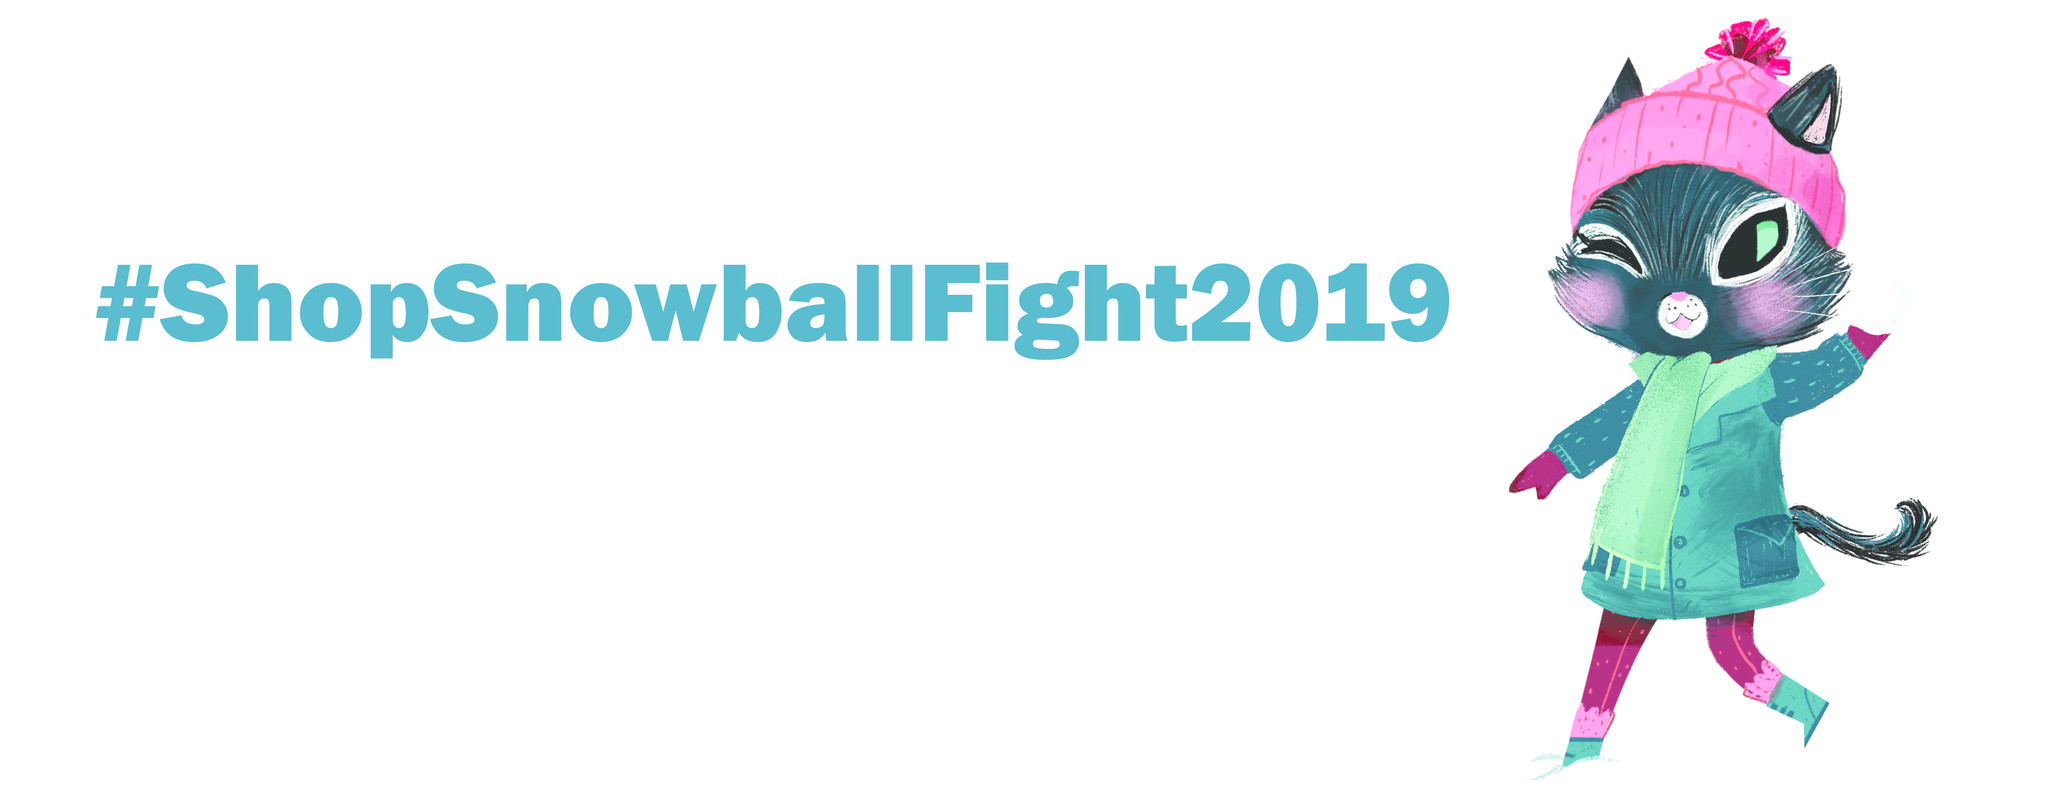 #ShopSnowballFight2019